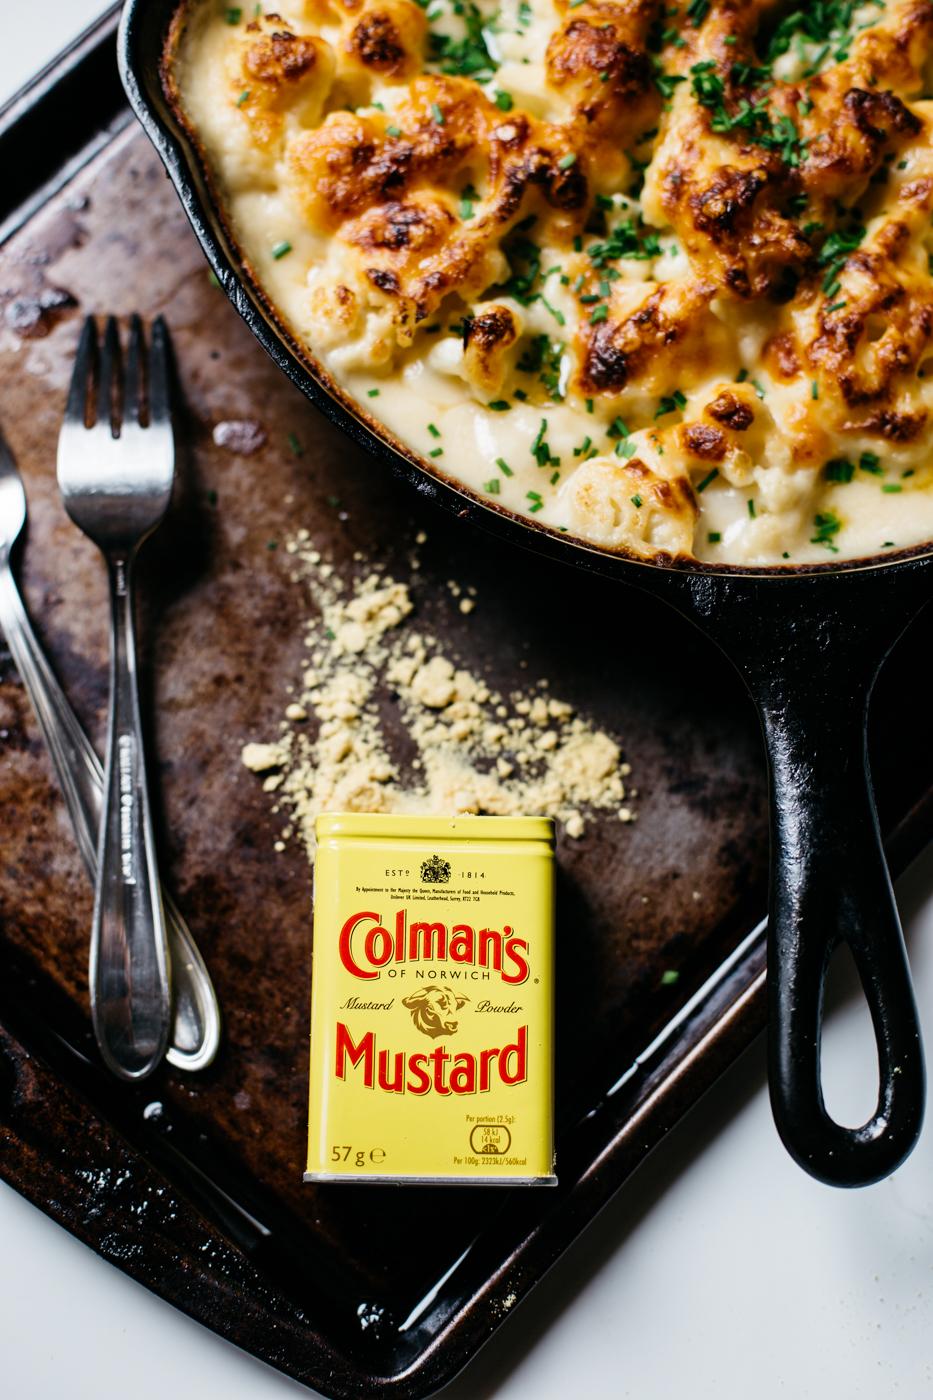 cheesy cauliflower, cauliflower recipes, make mac and cheese with cauliflower, southern cooking blog, the kentucky gent